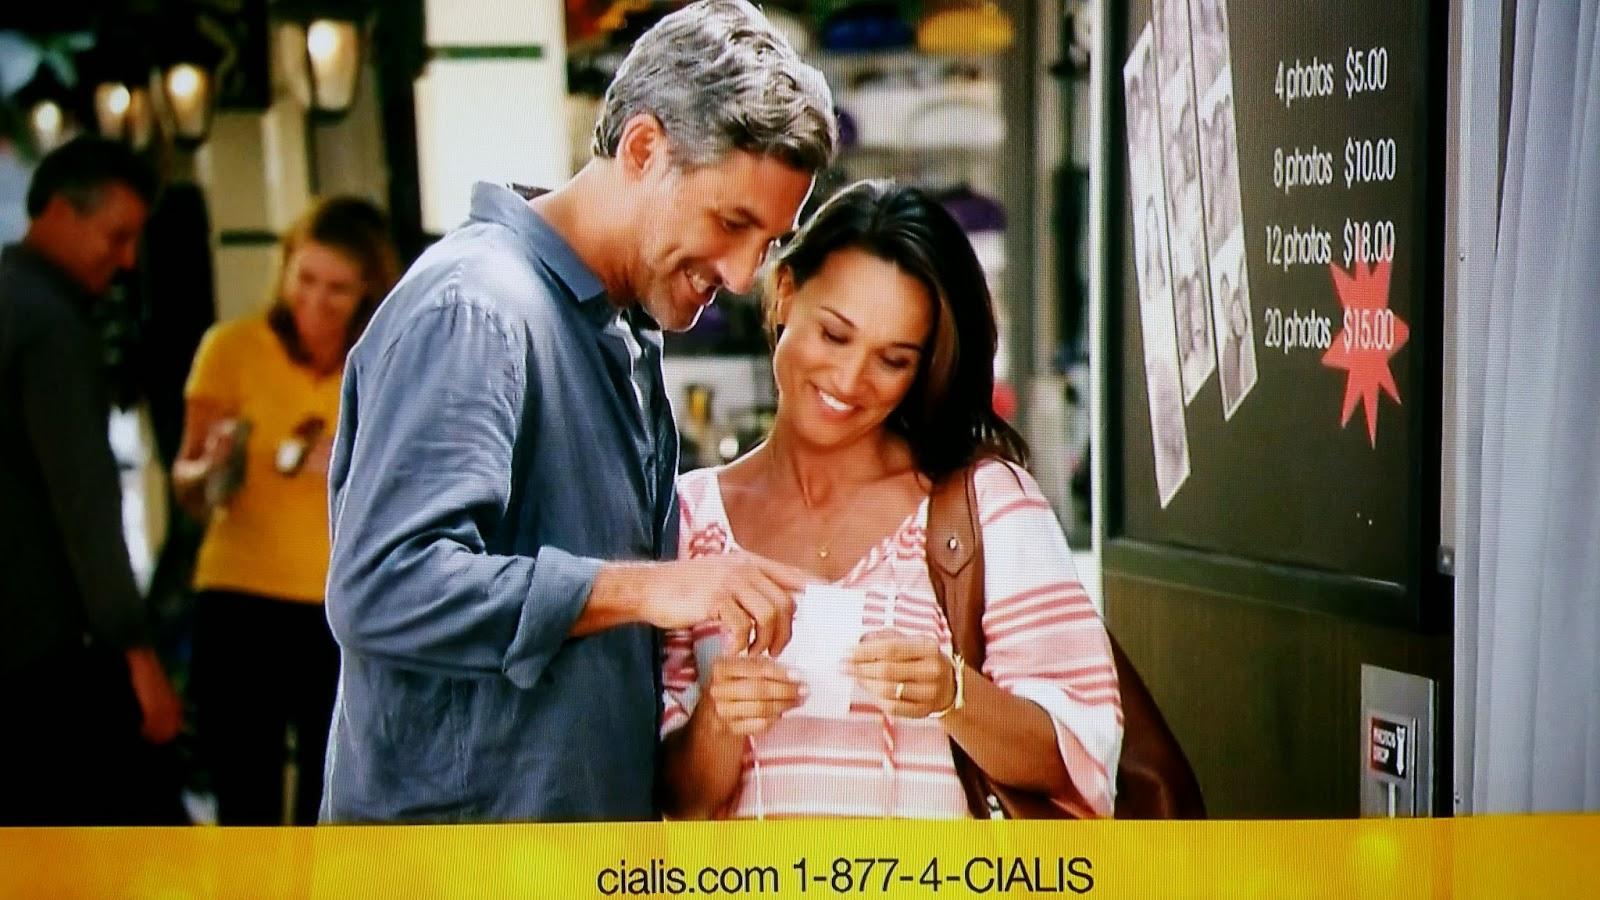 Tadalafil Cheap Generic, Tadalafil 5mg 20mg. Online Drug Store